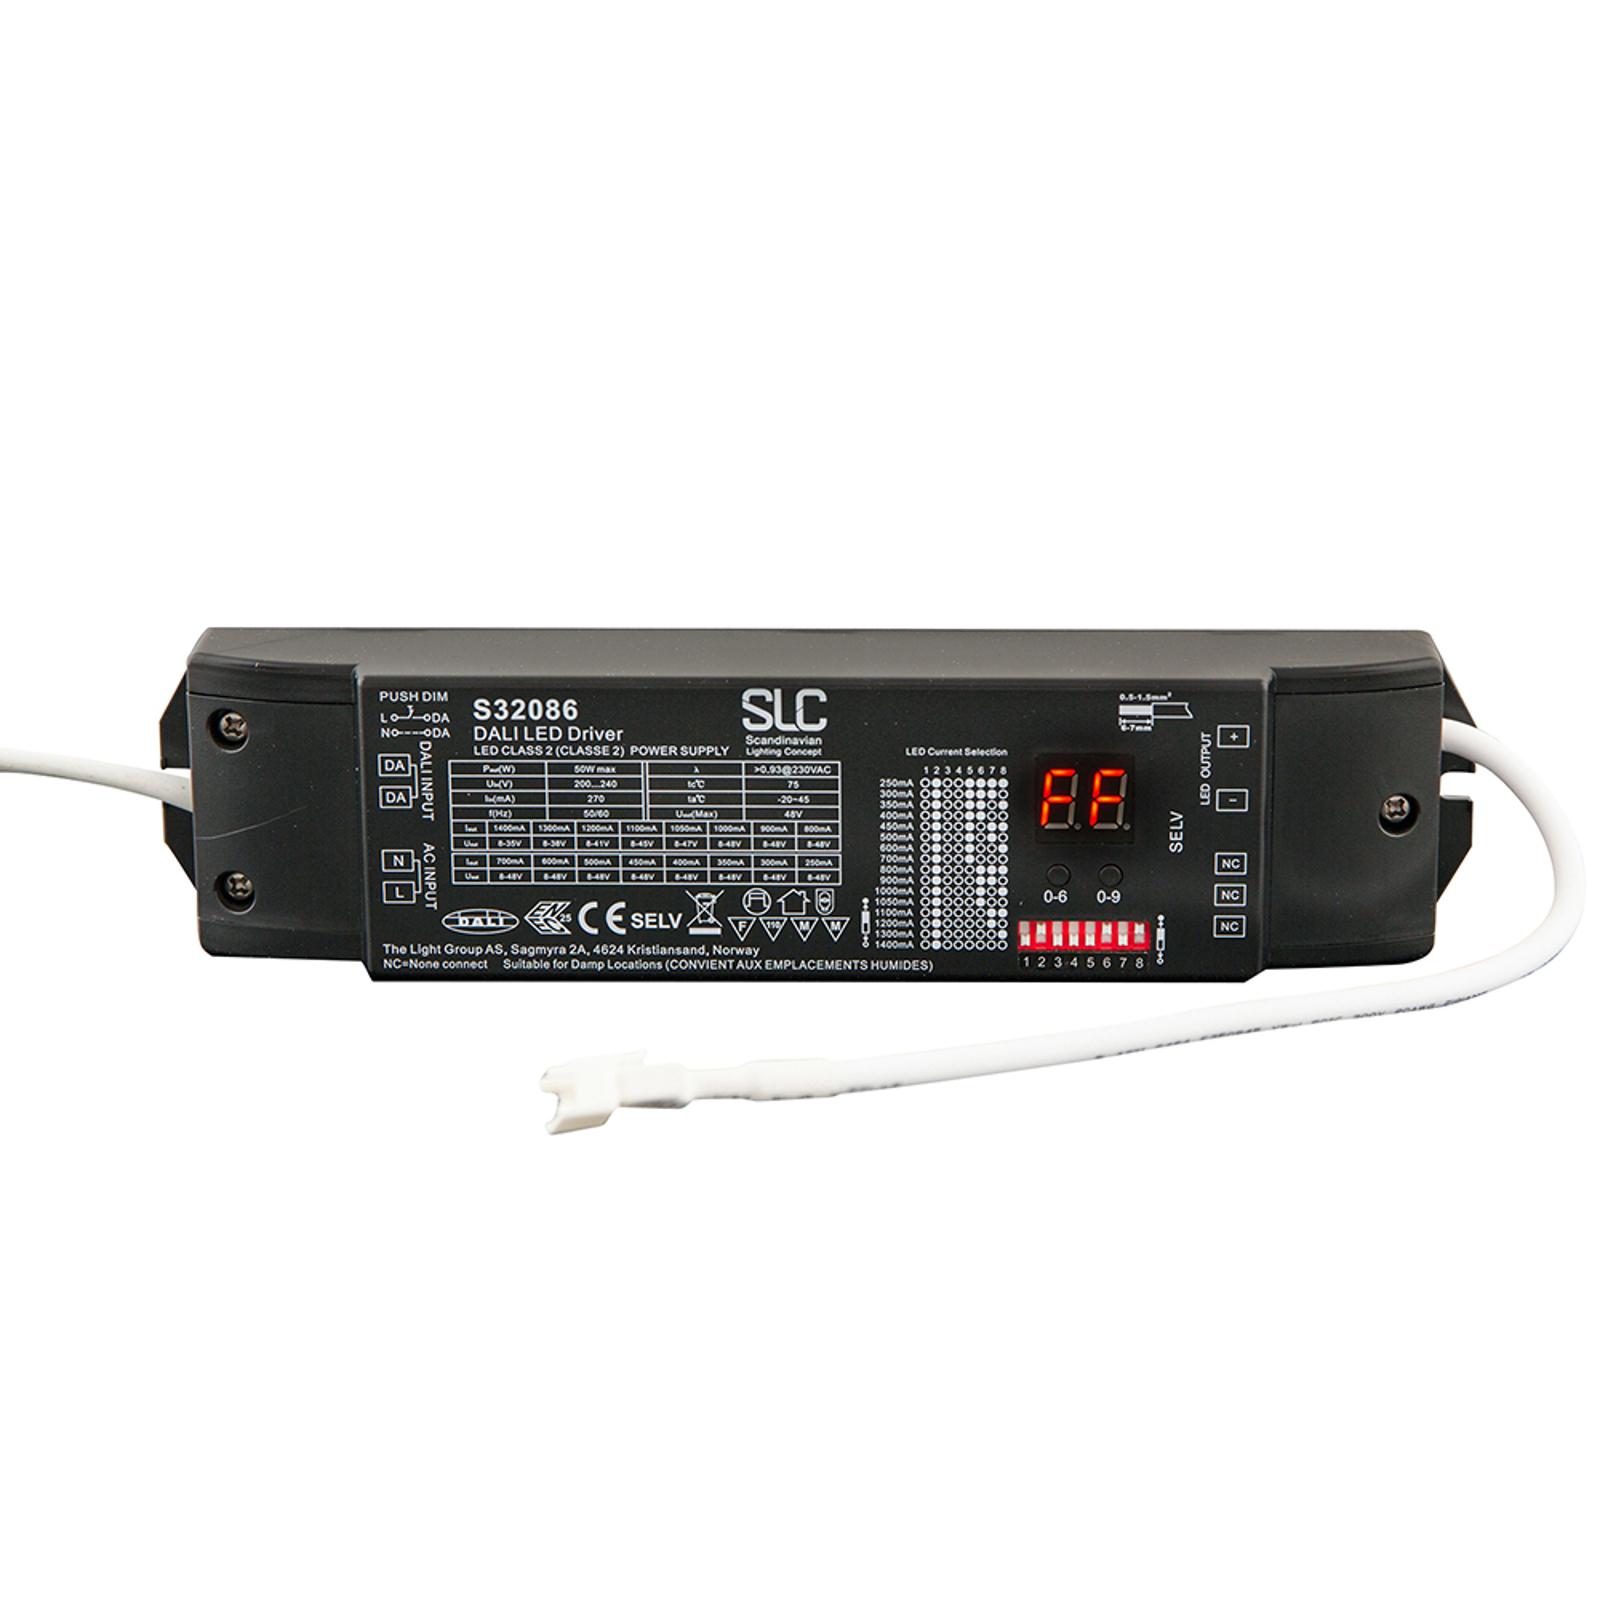 SLC driver 180-1.050mA, max. 50W, DALI DT6